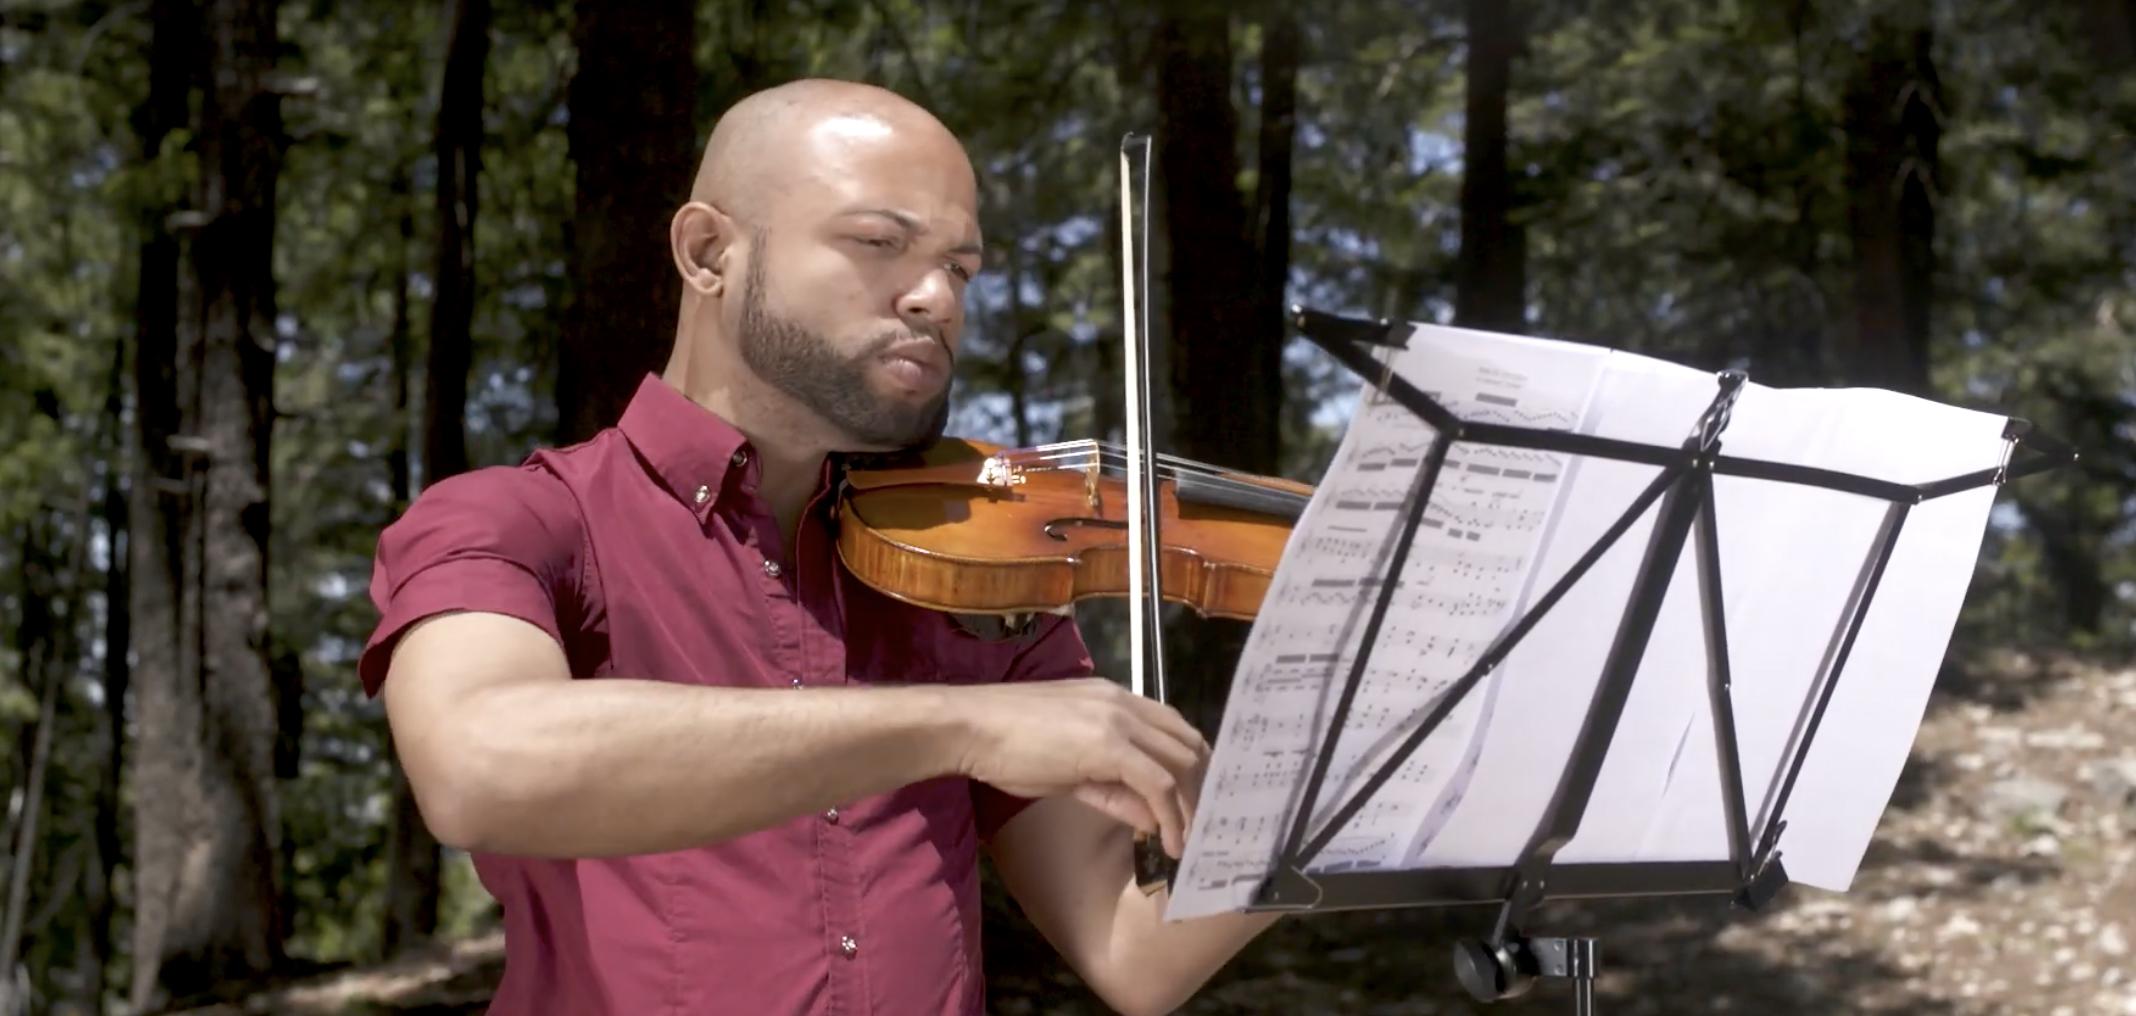 Master violinist inspired by Itzhak Perlman on Sesame Street